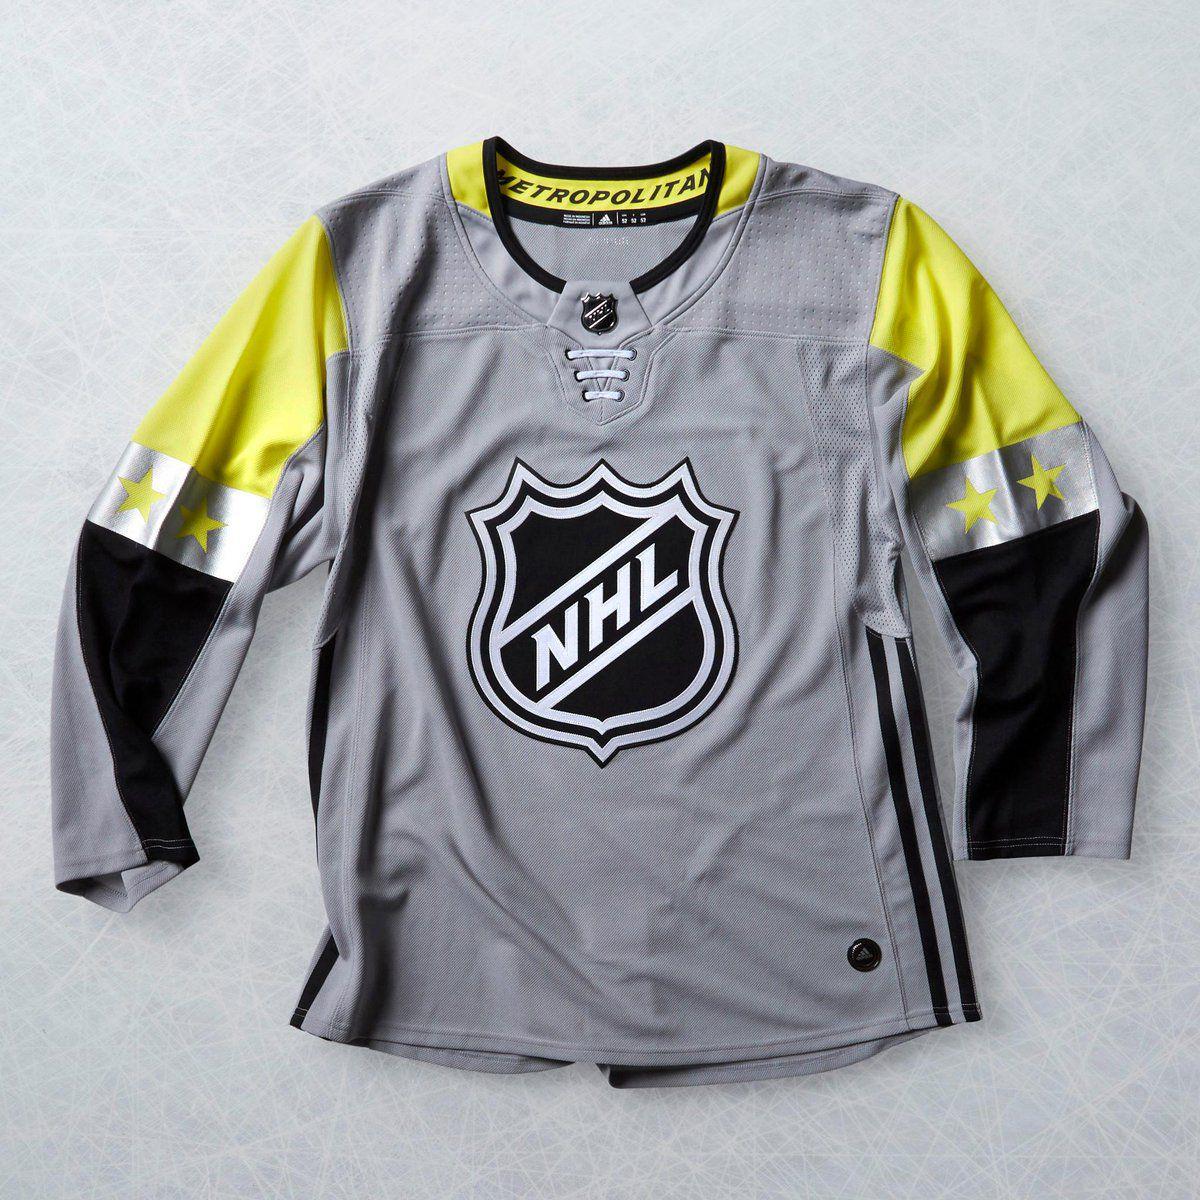 metropolitan division all star jersey